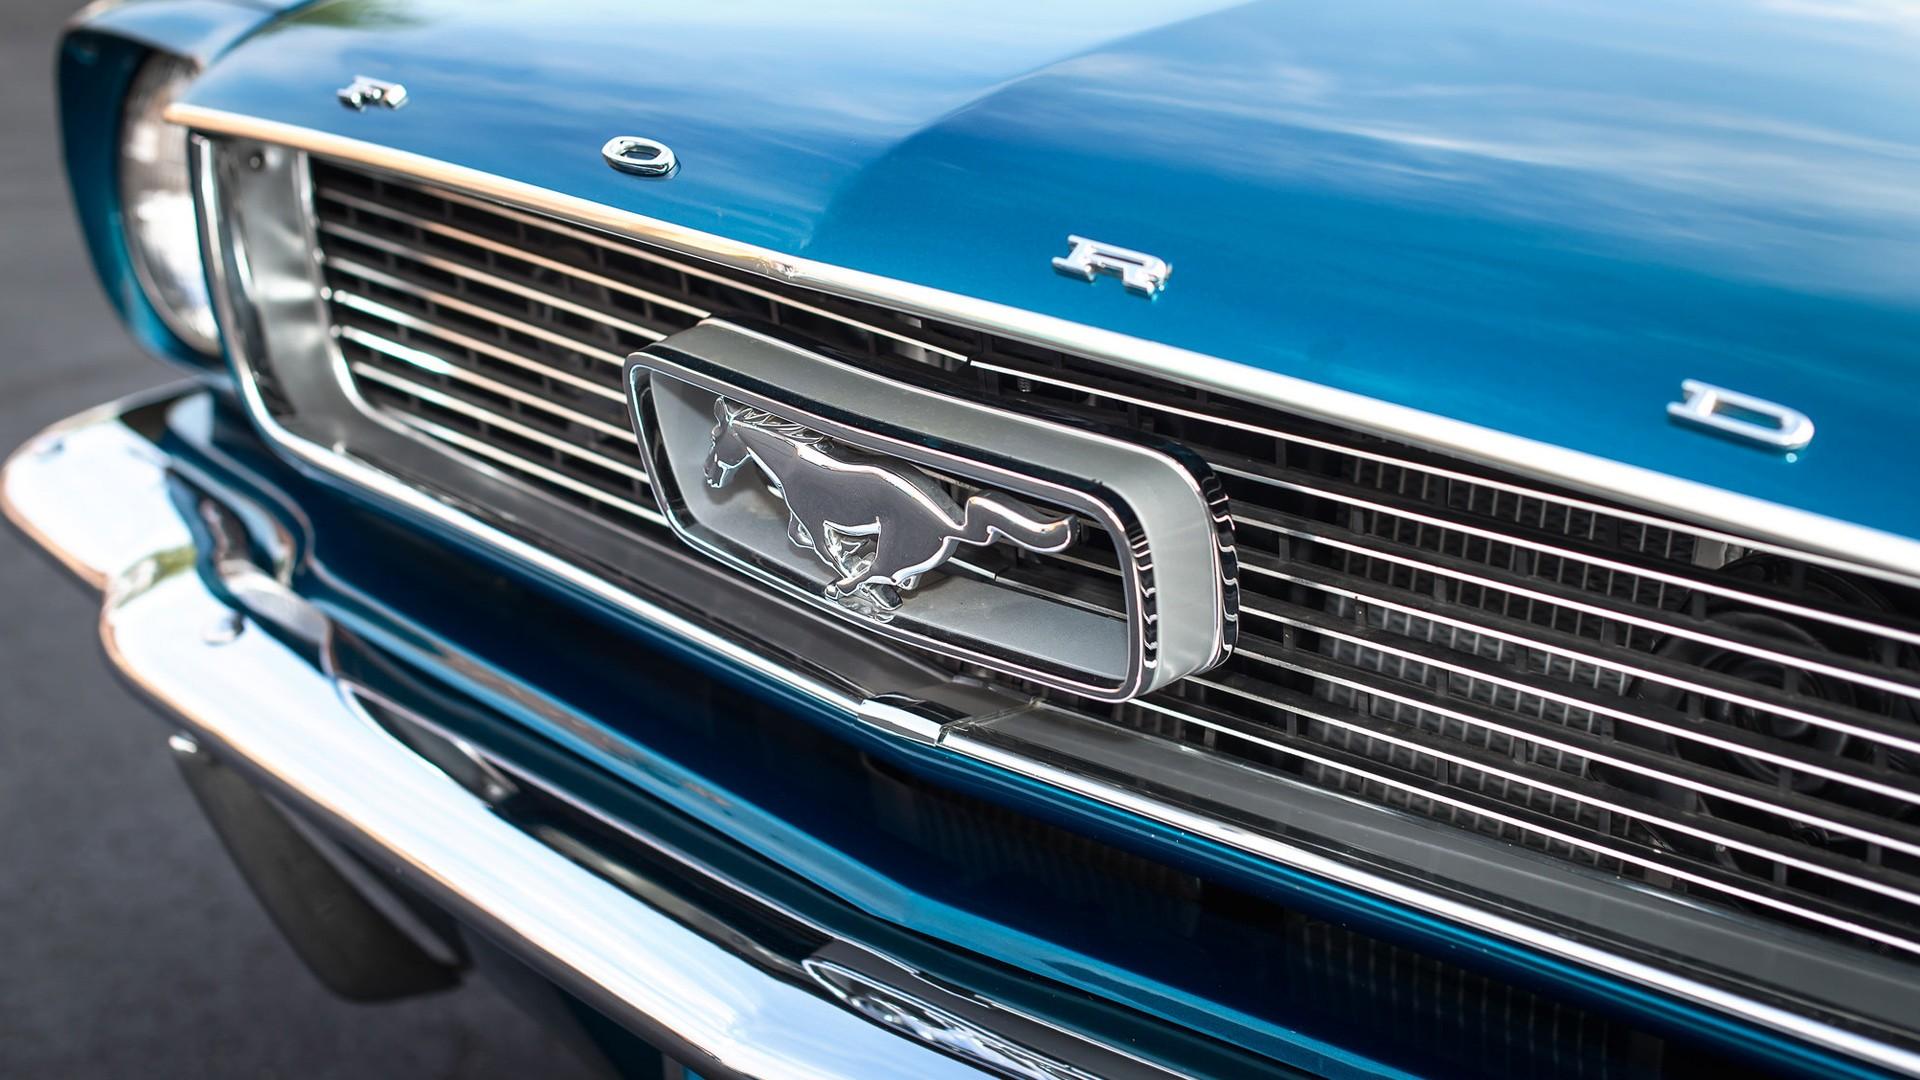 Ford Mustang Hd Wallpaper Hd Car Wallpapers Id 6939